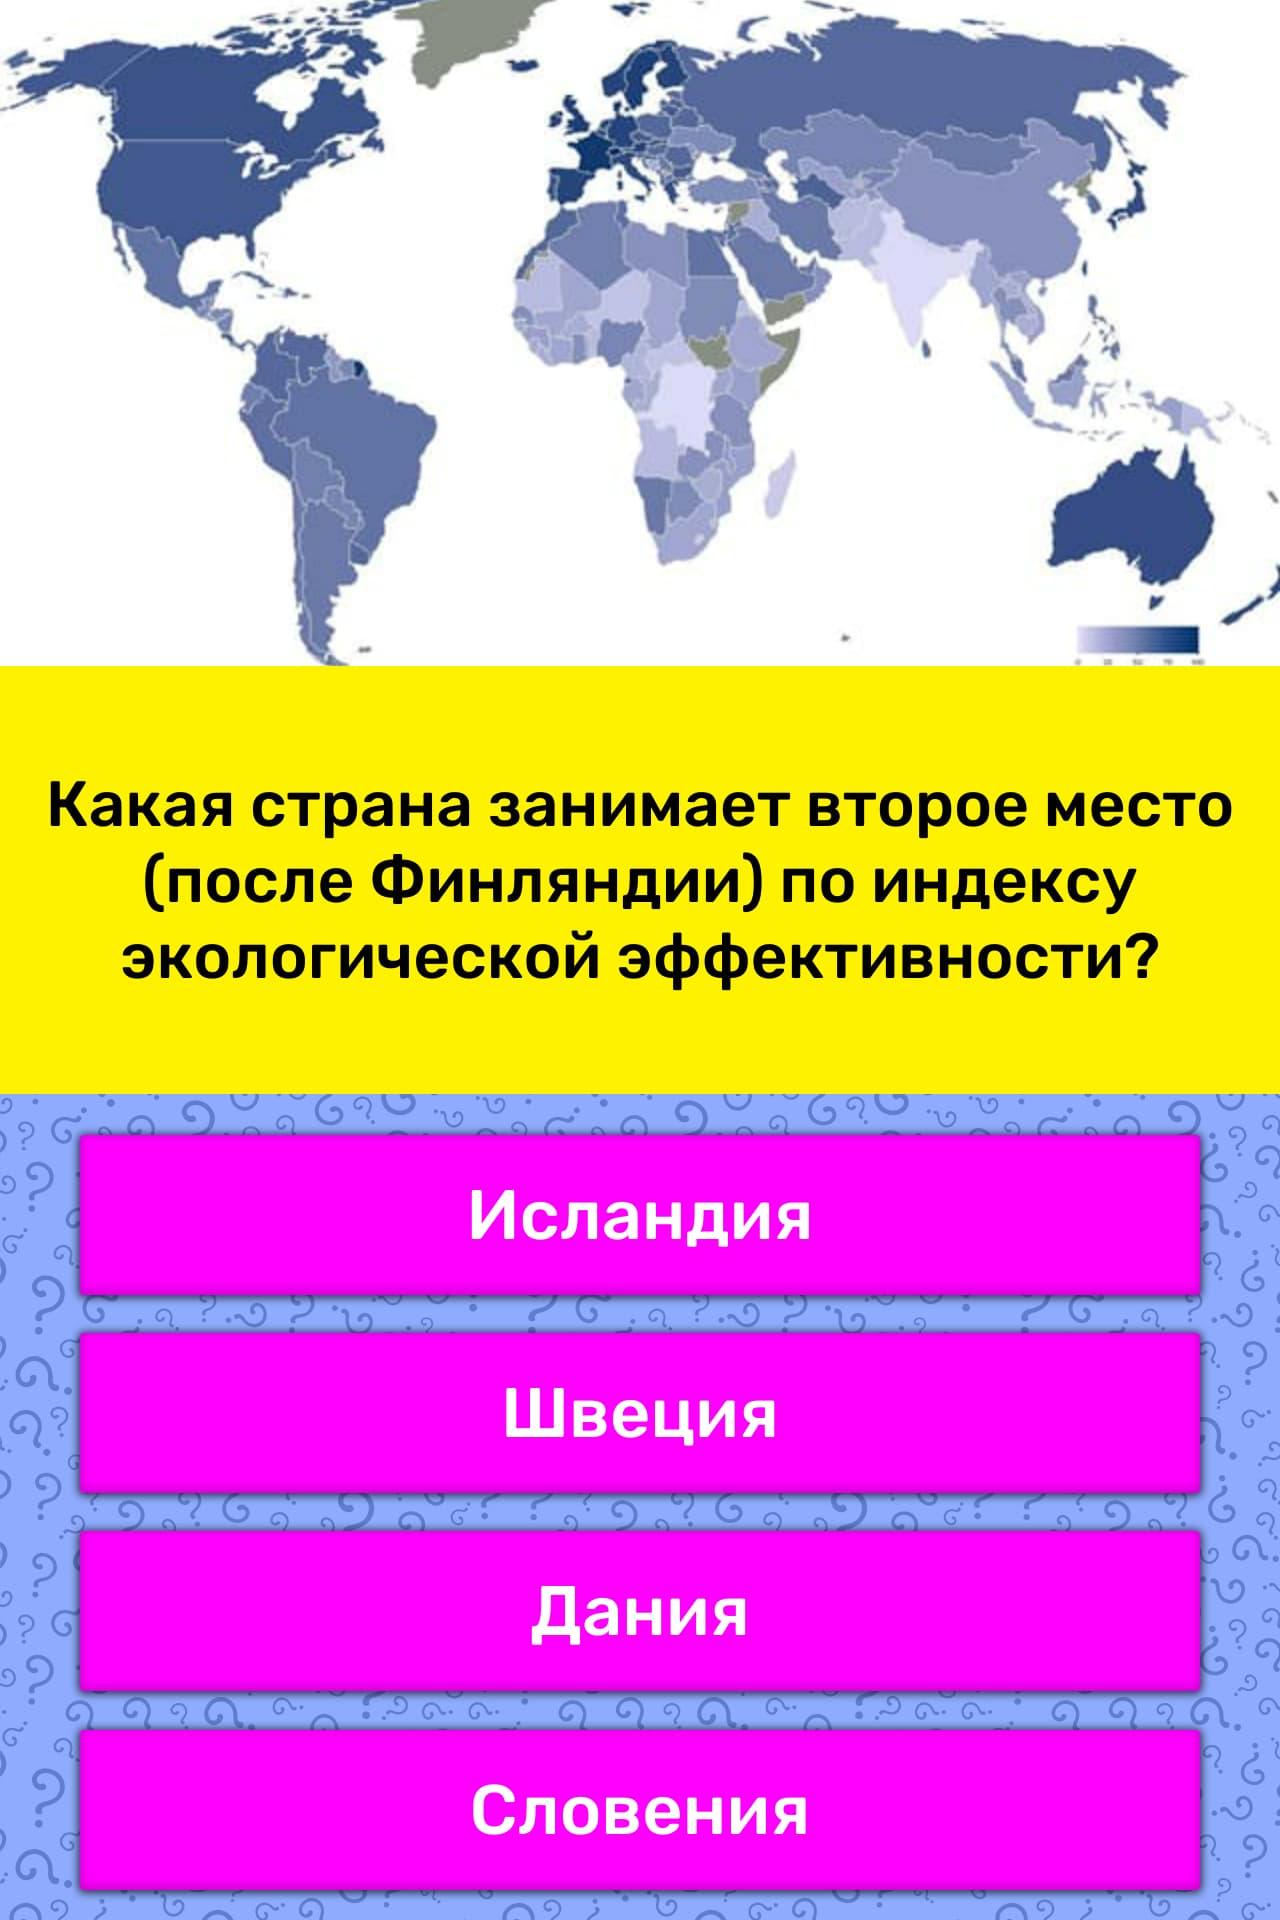 какая страна занимает 2 место по площади